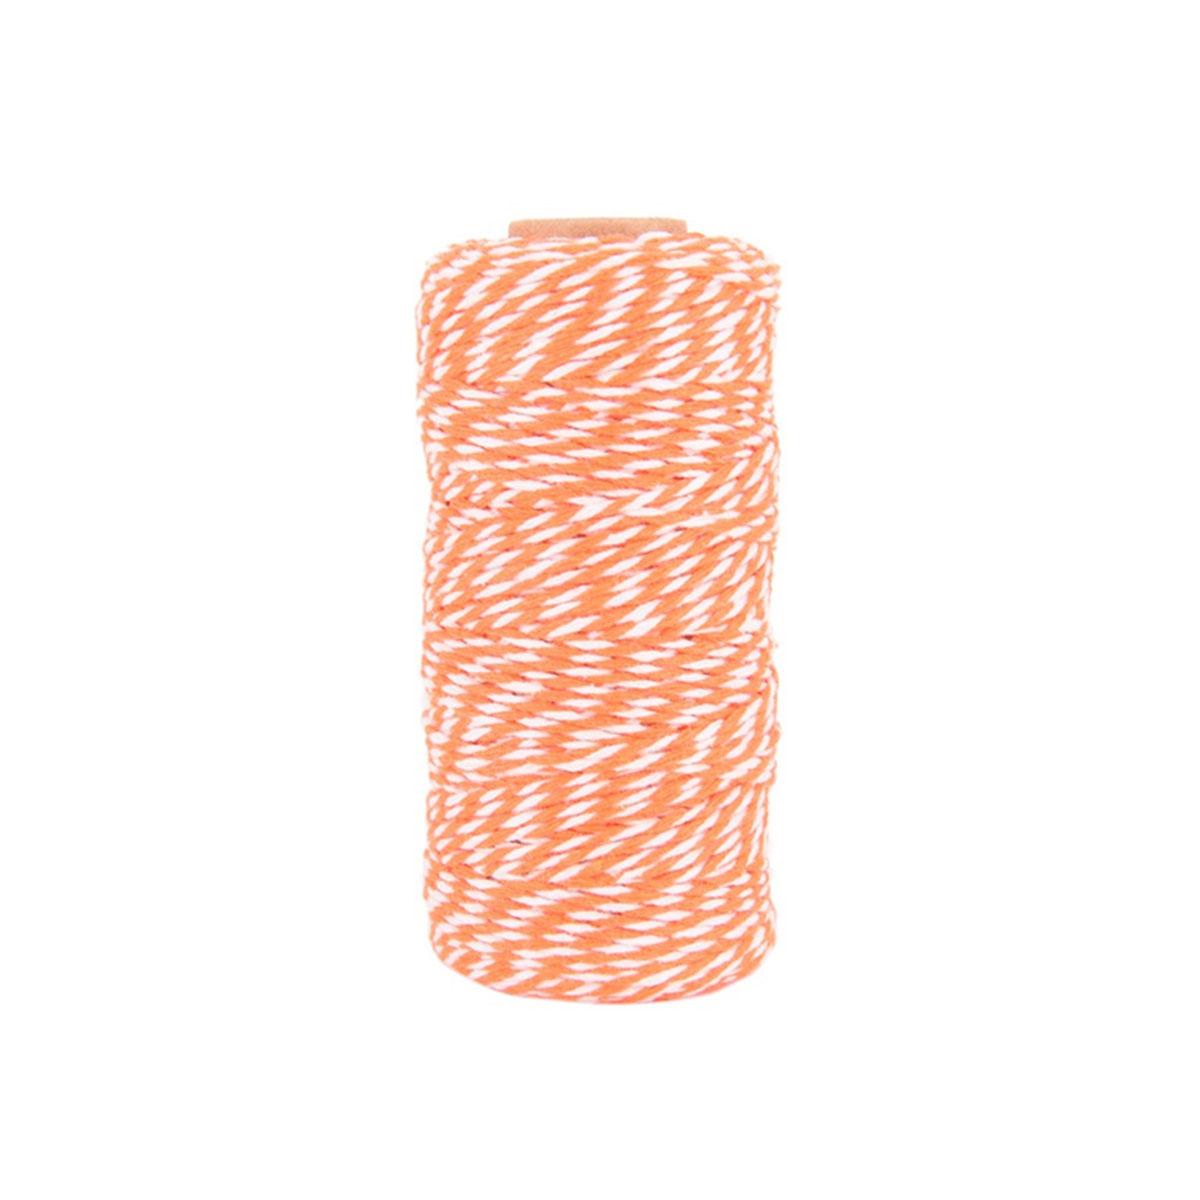 Baker twine orange